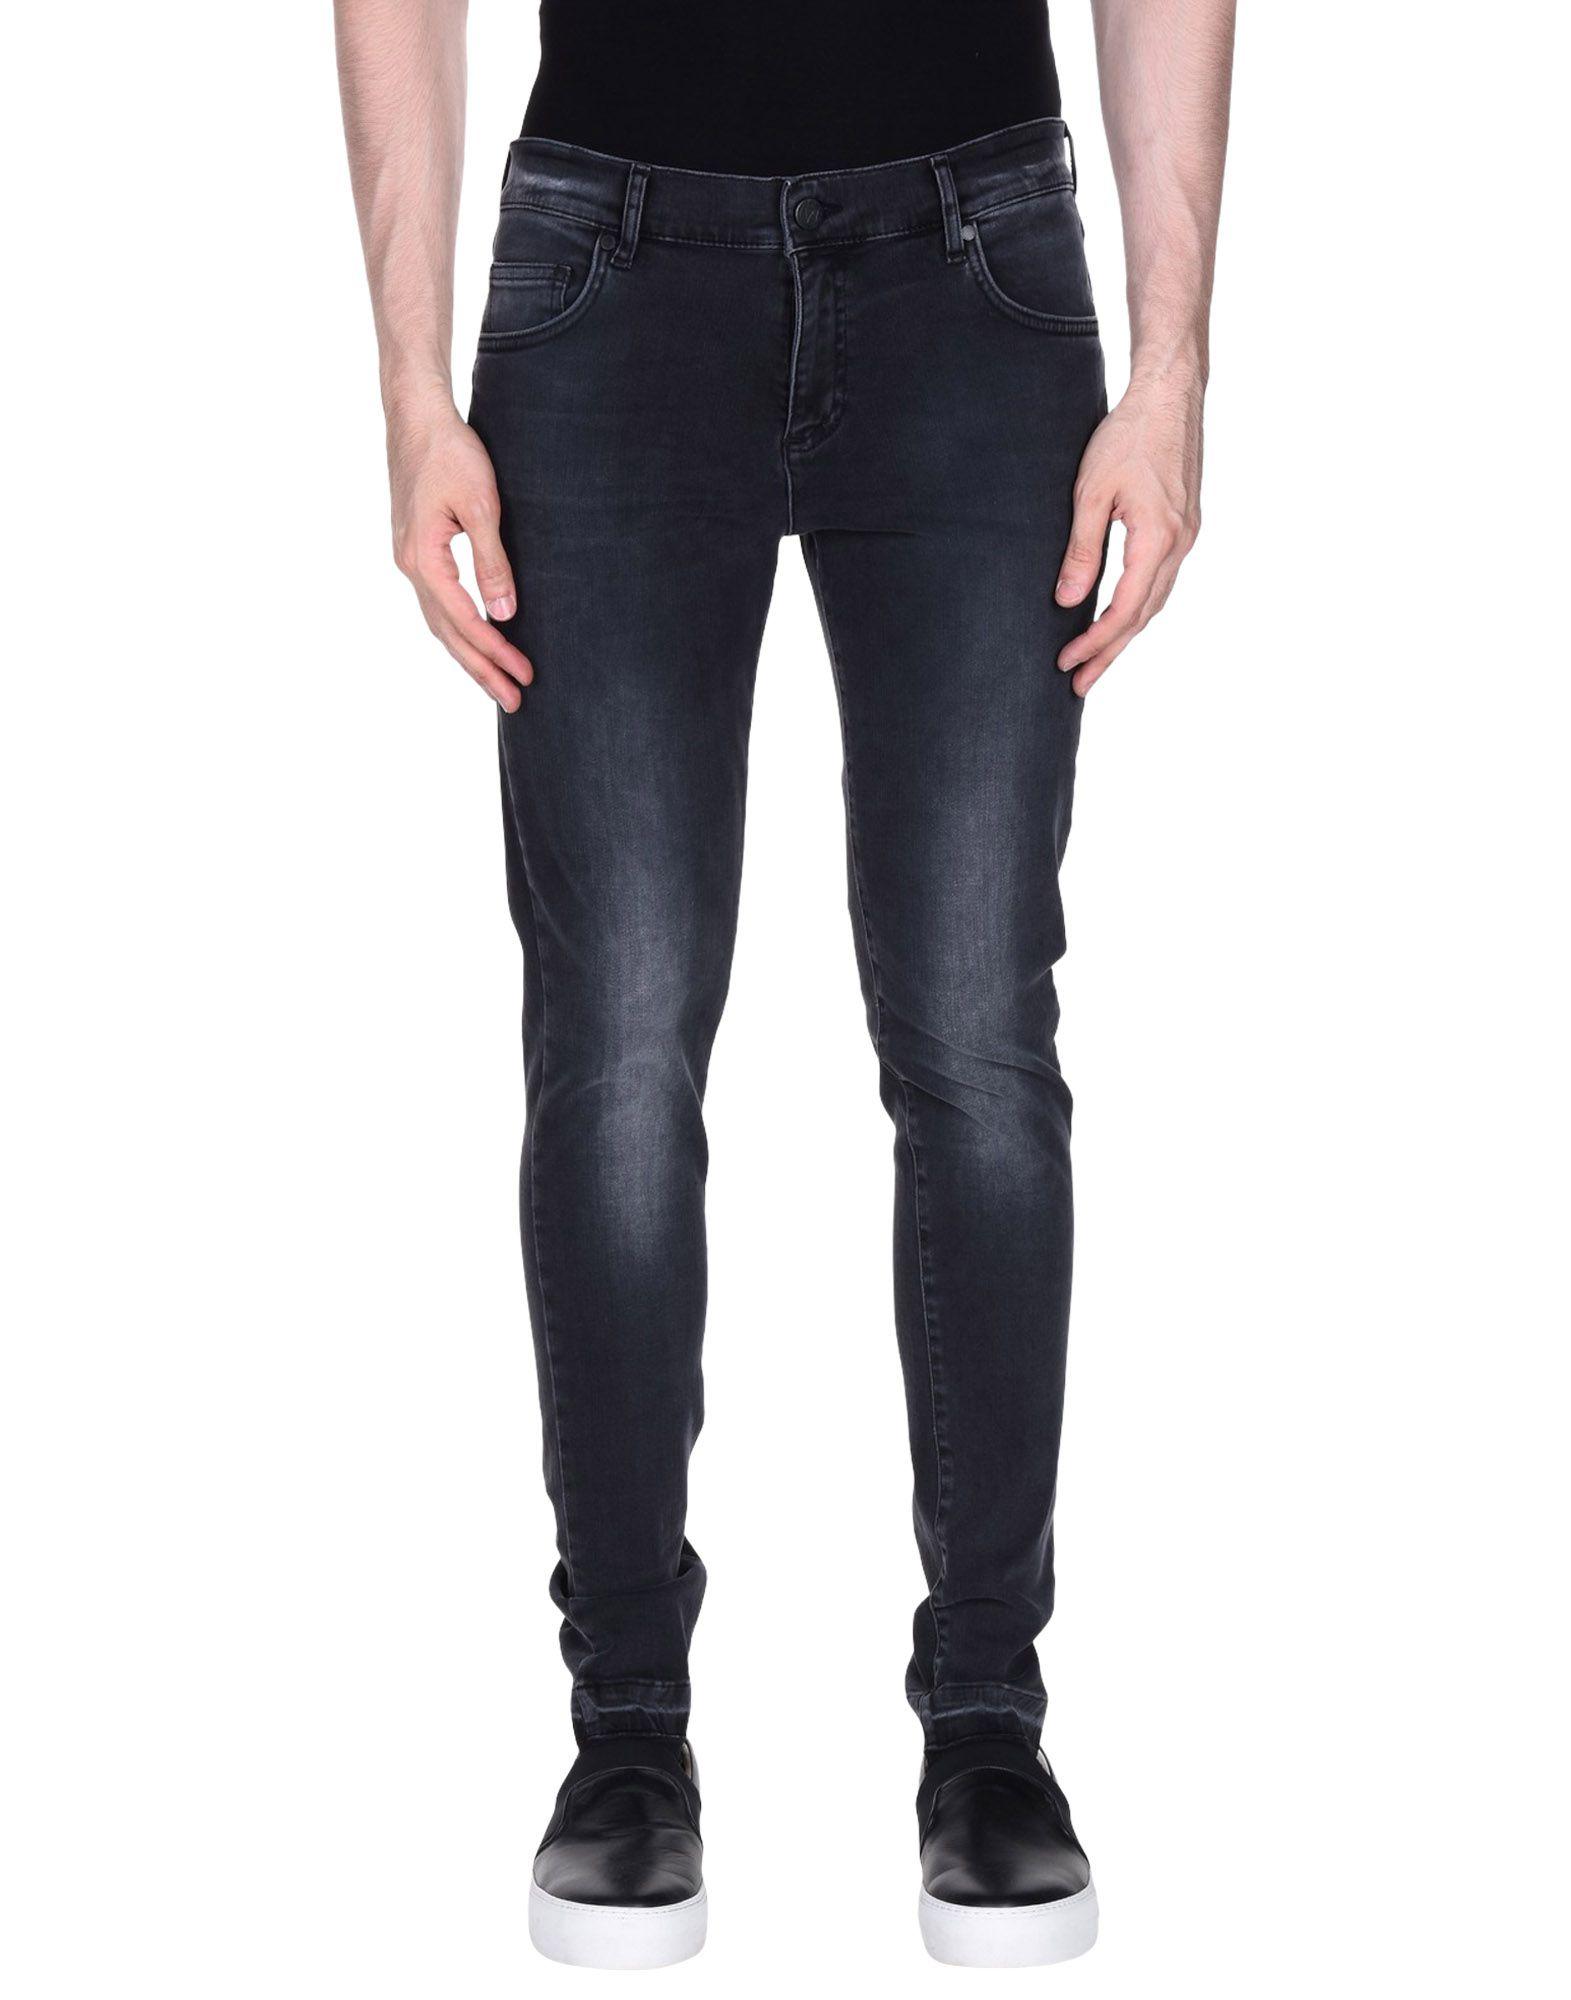 Pantaloni Jeans Versace - Jeans Uomo - Versace 42681894KG 6afc2b